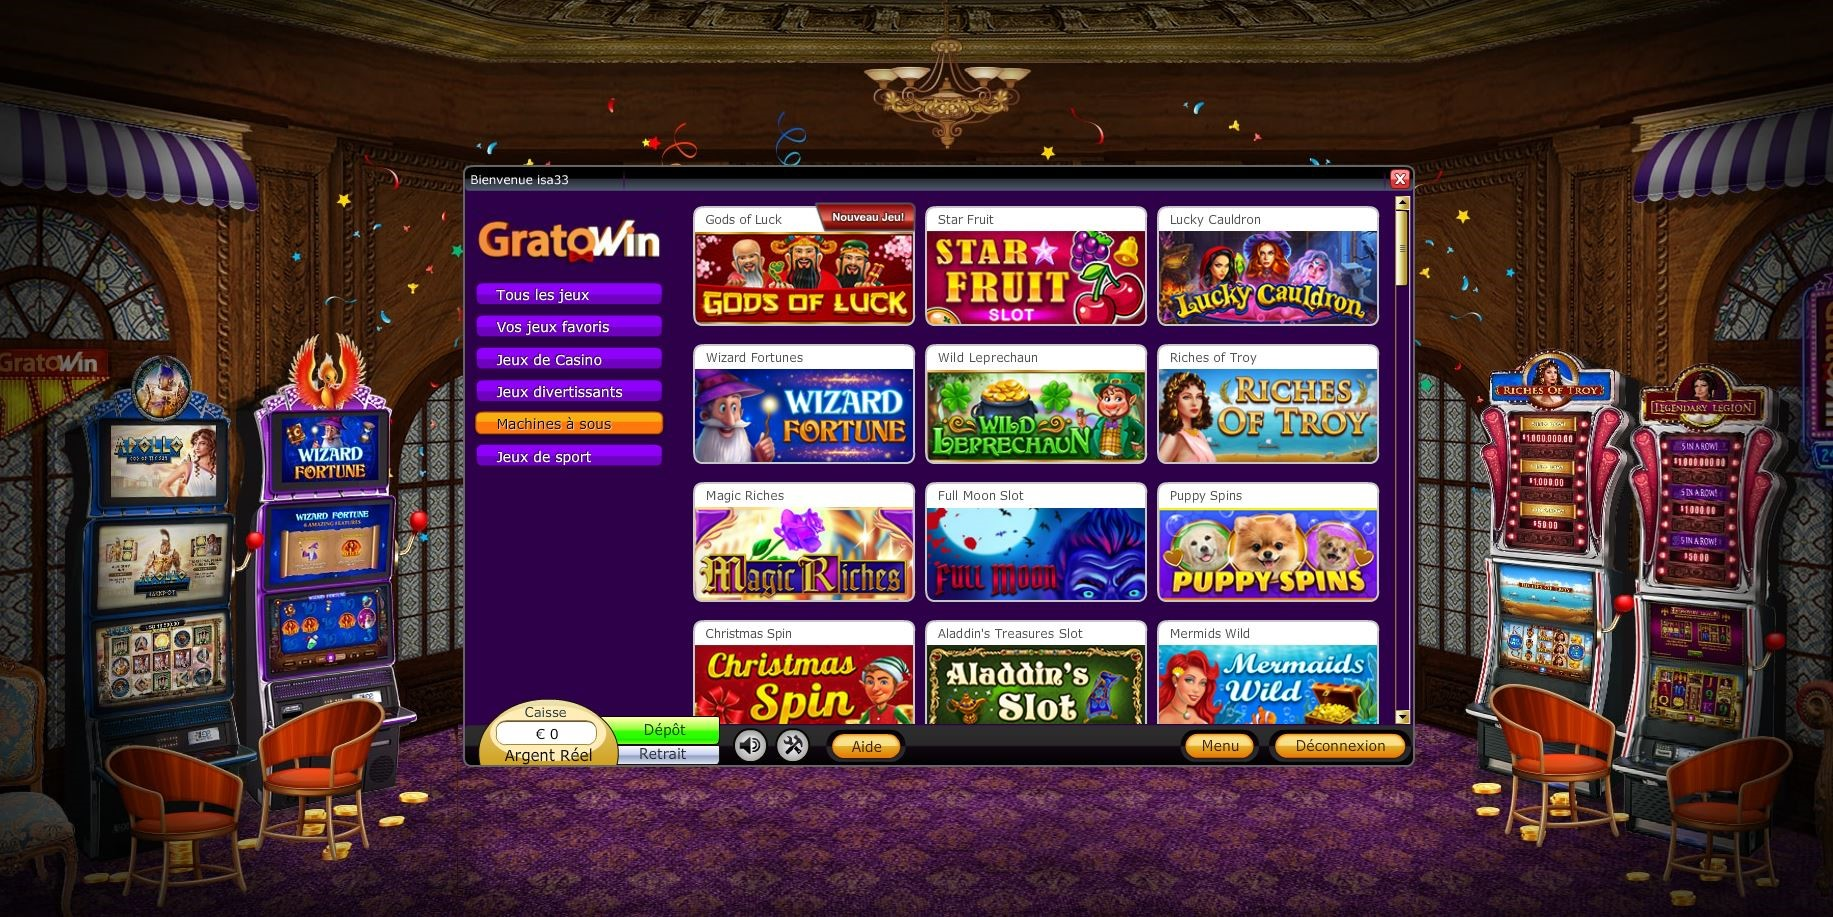 Avis GratoWin Casino : pourquoi il faut éviter ce casino